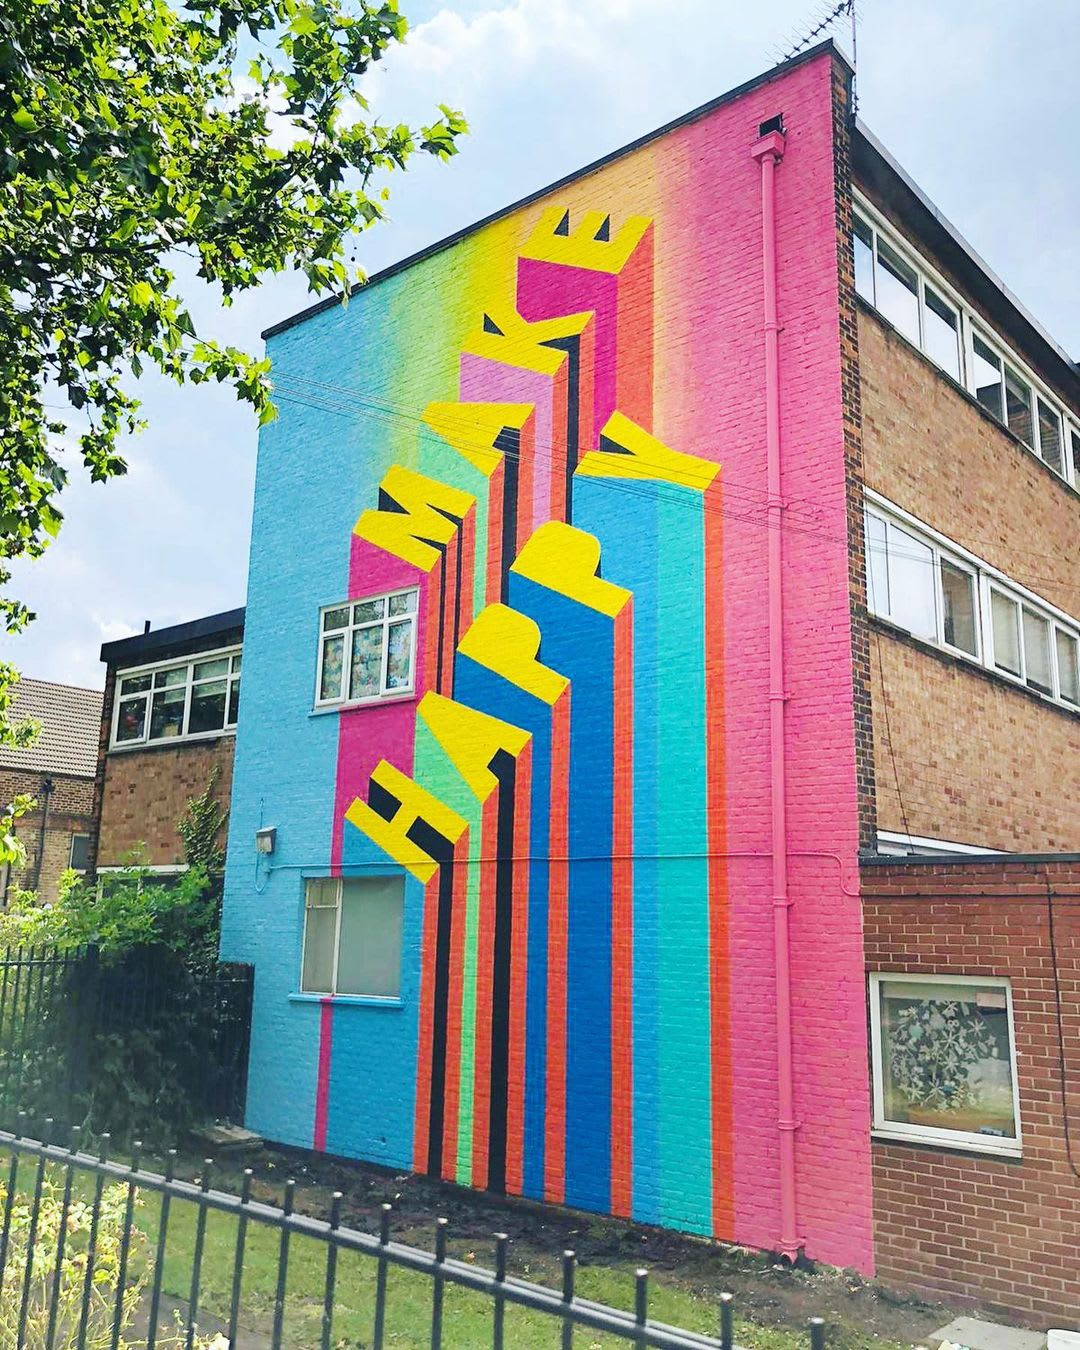 Artwork By Morag Myerscough in London